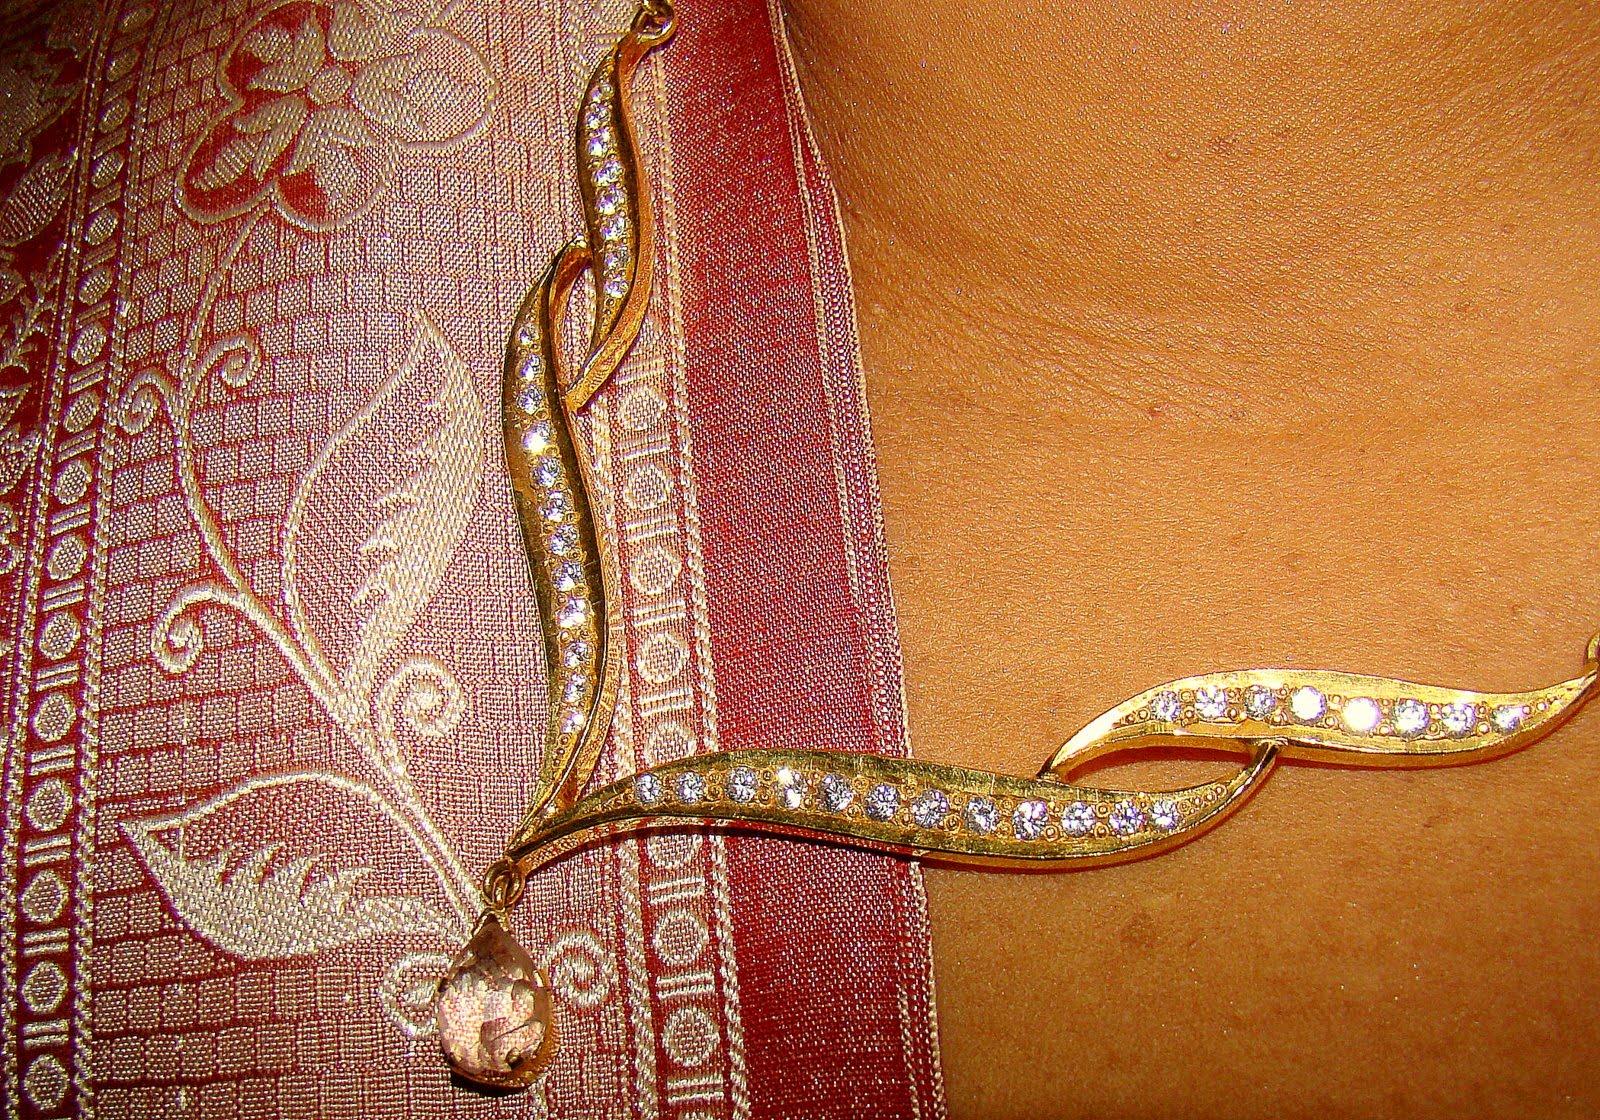 how to find gems in sri lanka